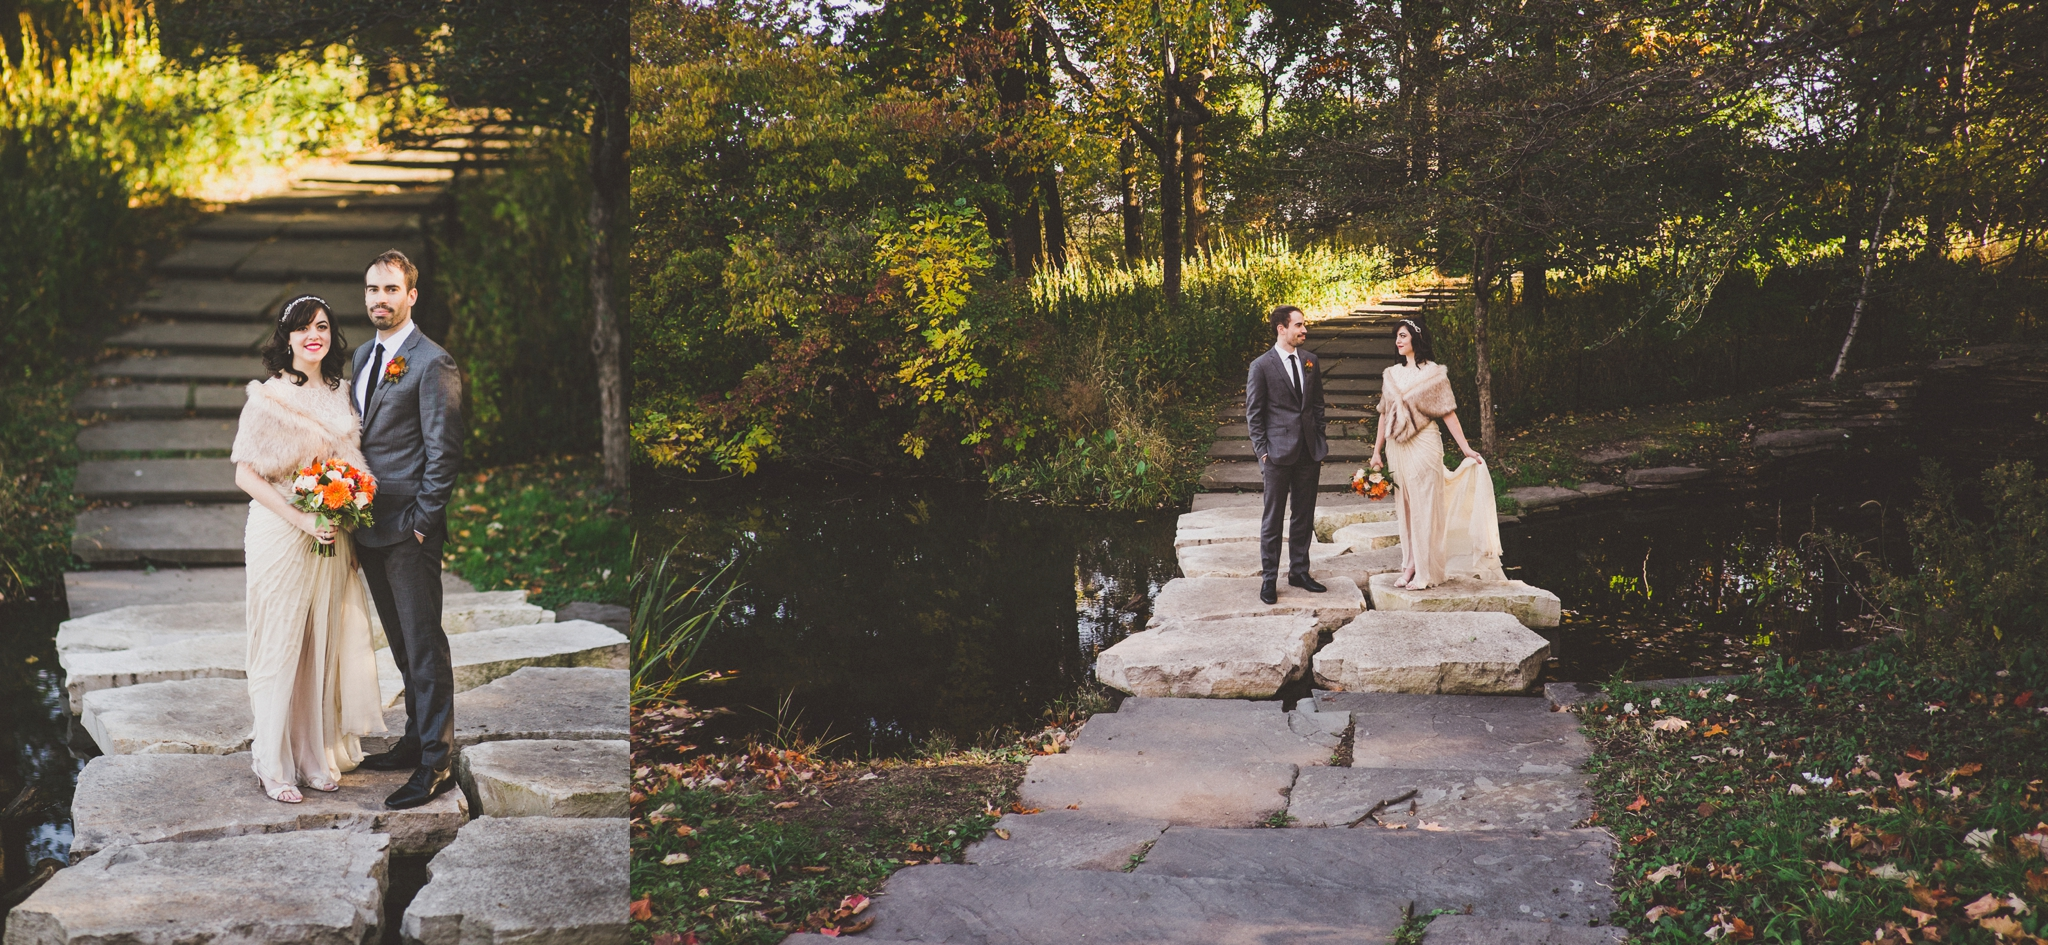 Columbus-Park-Refectory-Wedding-035.jpg